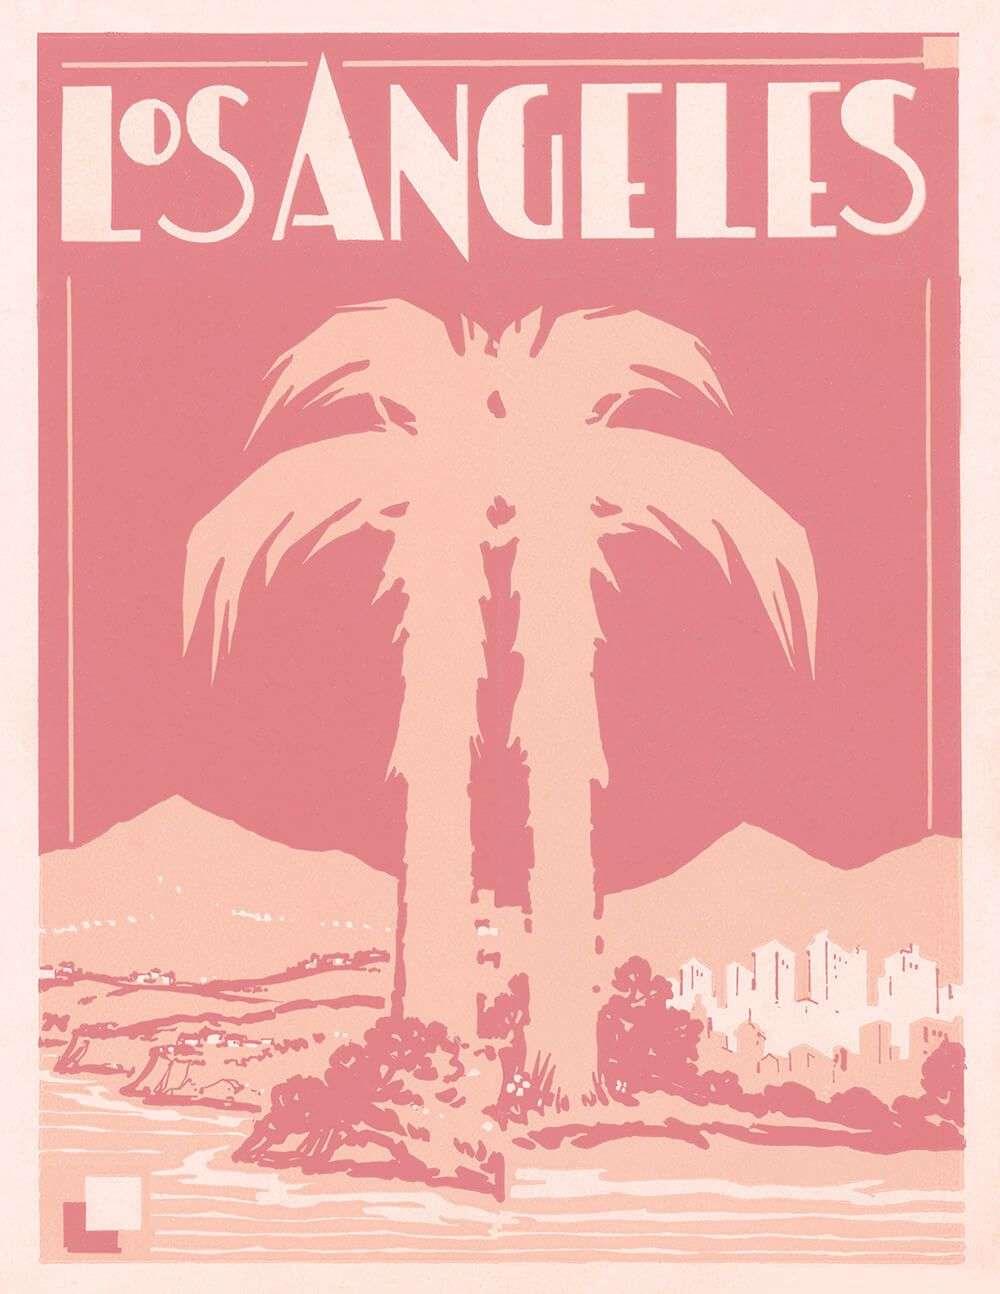 Home Capricorn Press - Vintage los angeles map poster